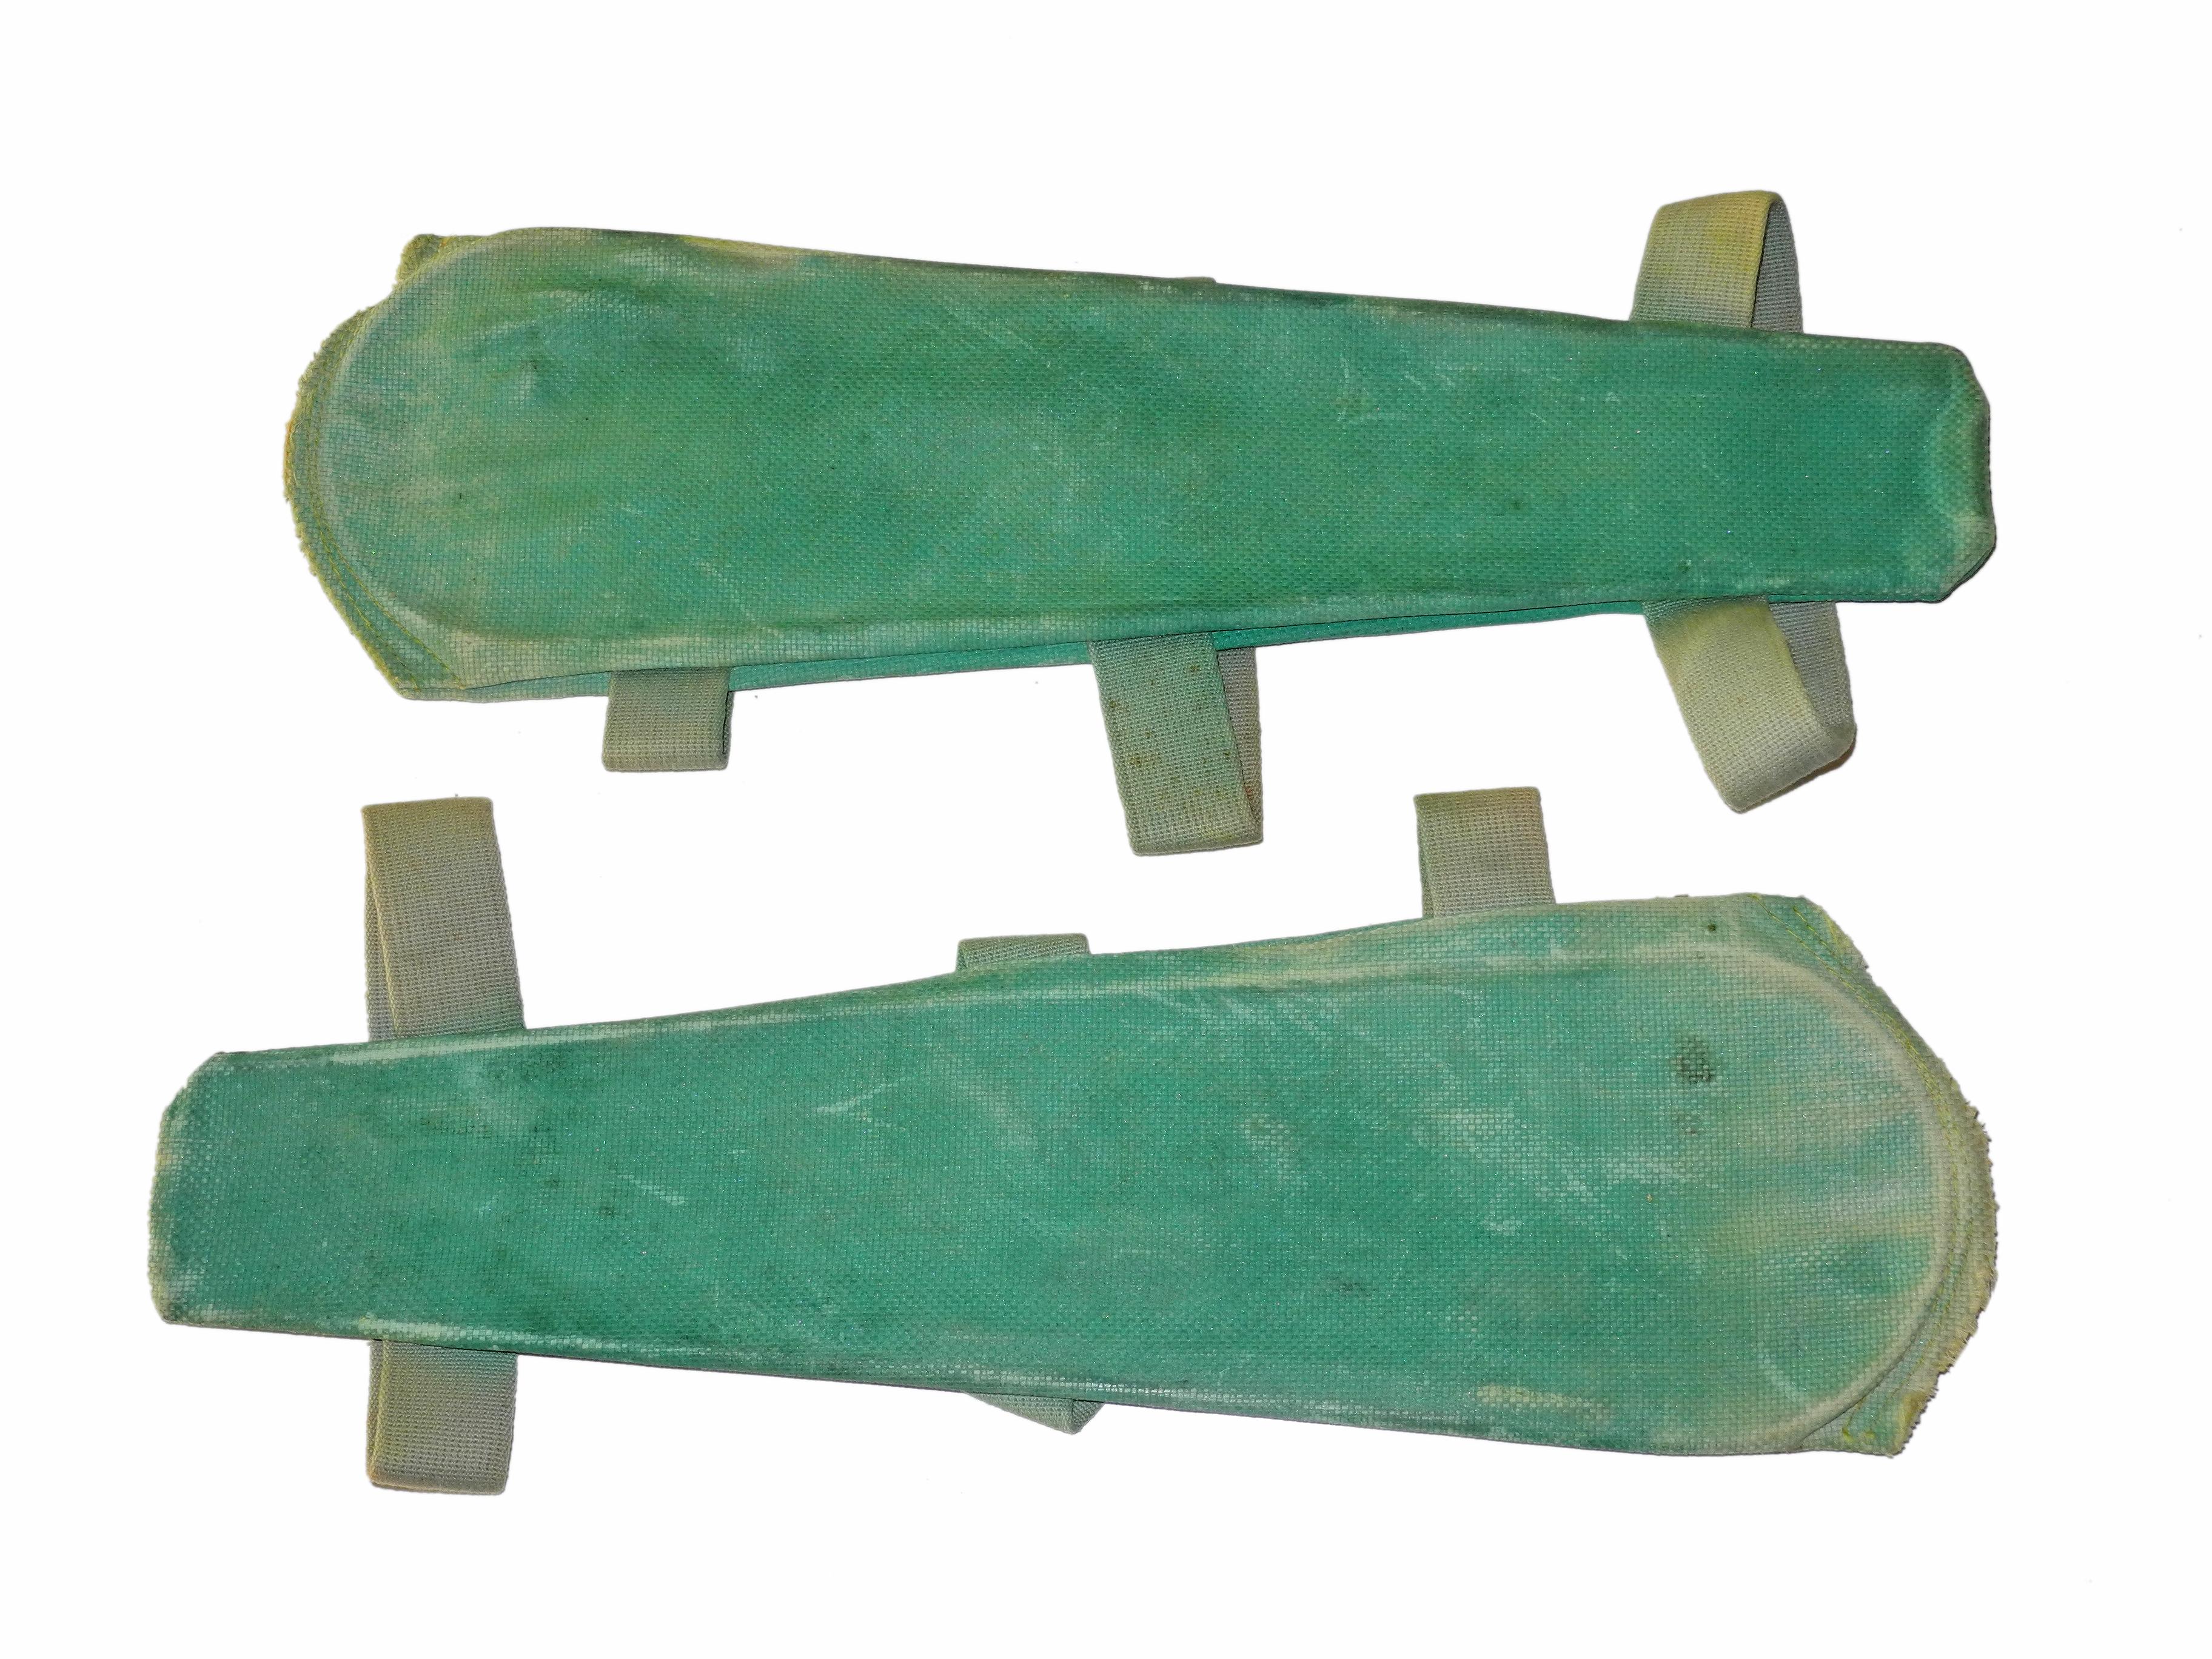 AAF / USN 1-man life raft paddles